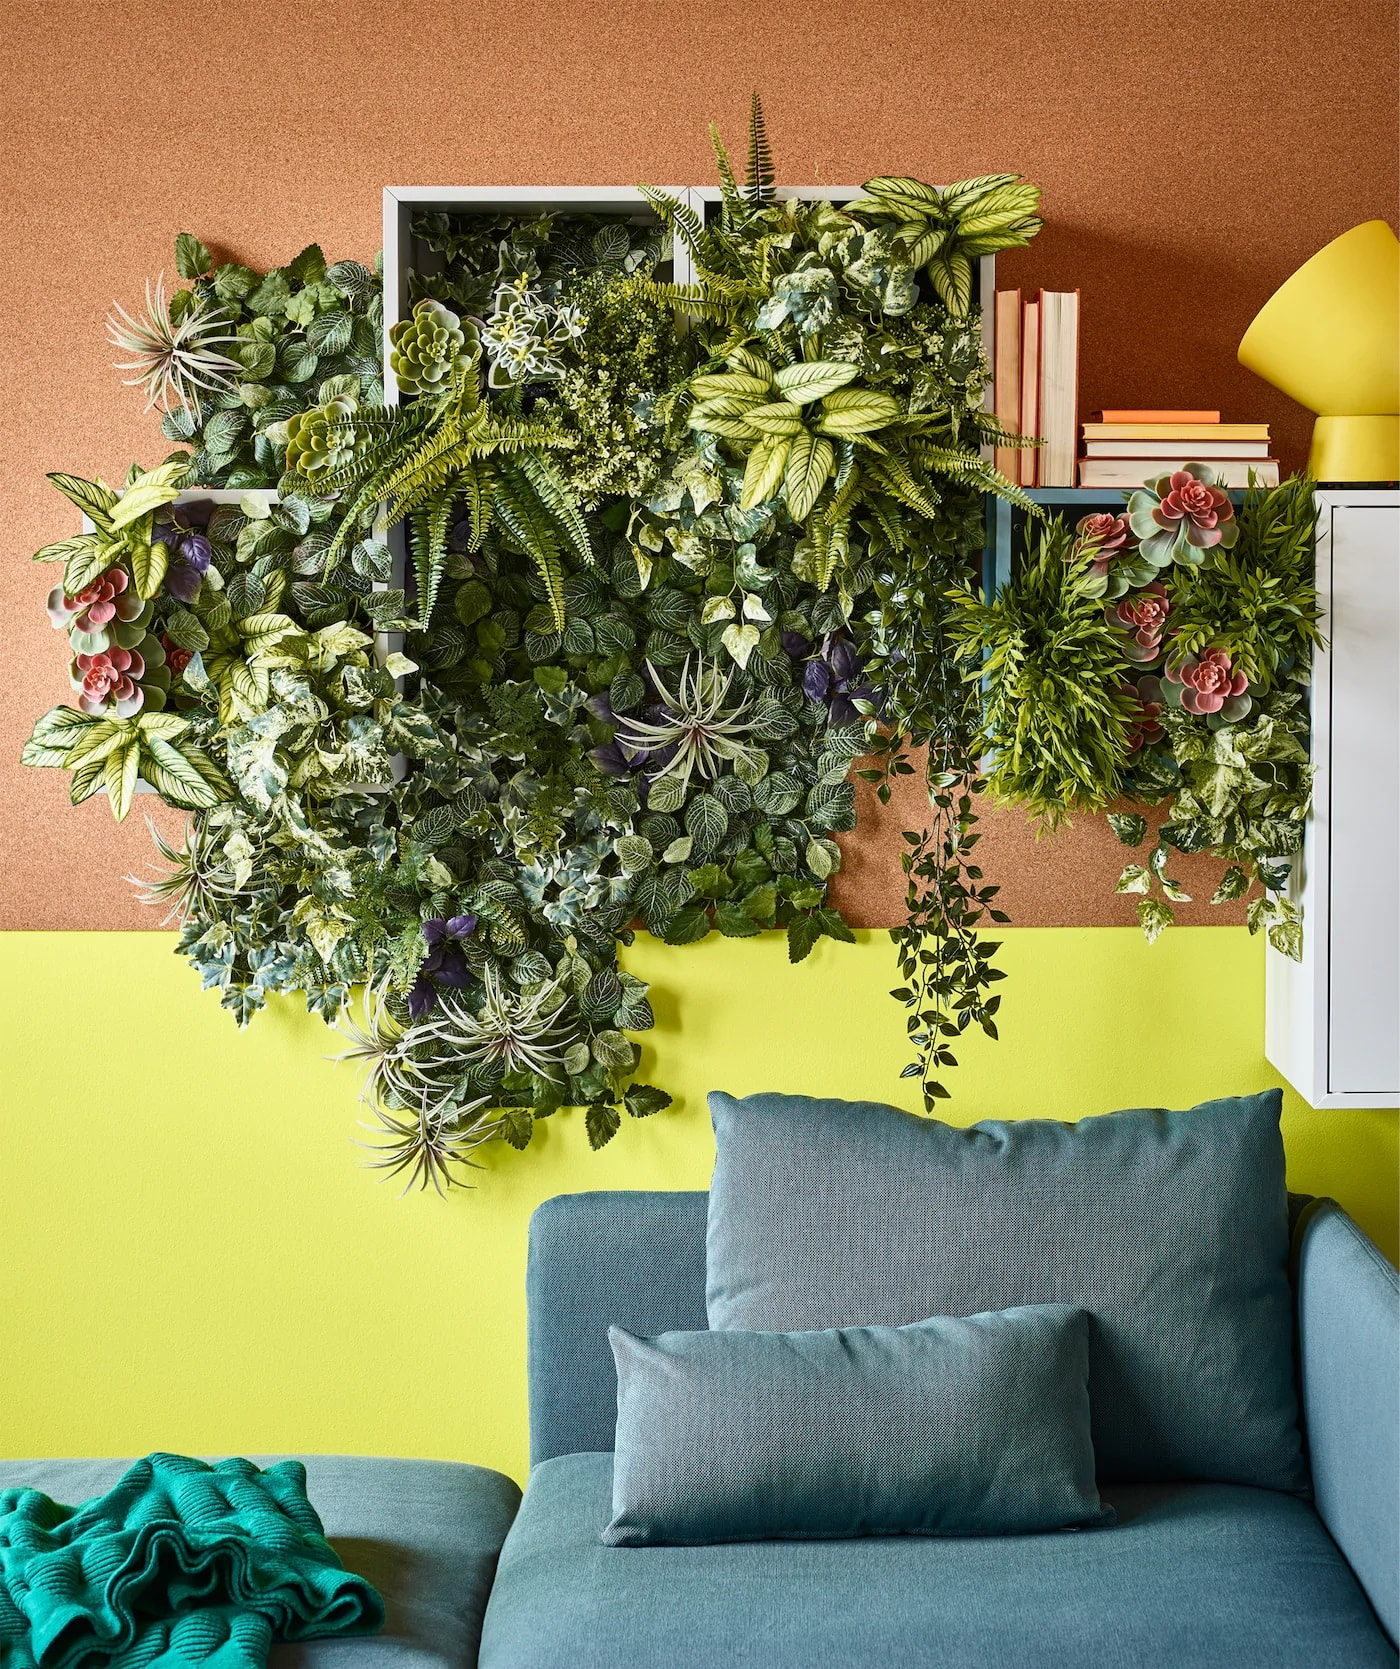 ikea duvar aksesuarlari ile dekorasyon fikirleri (3)-min